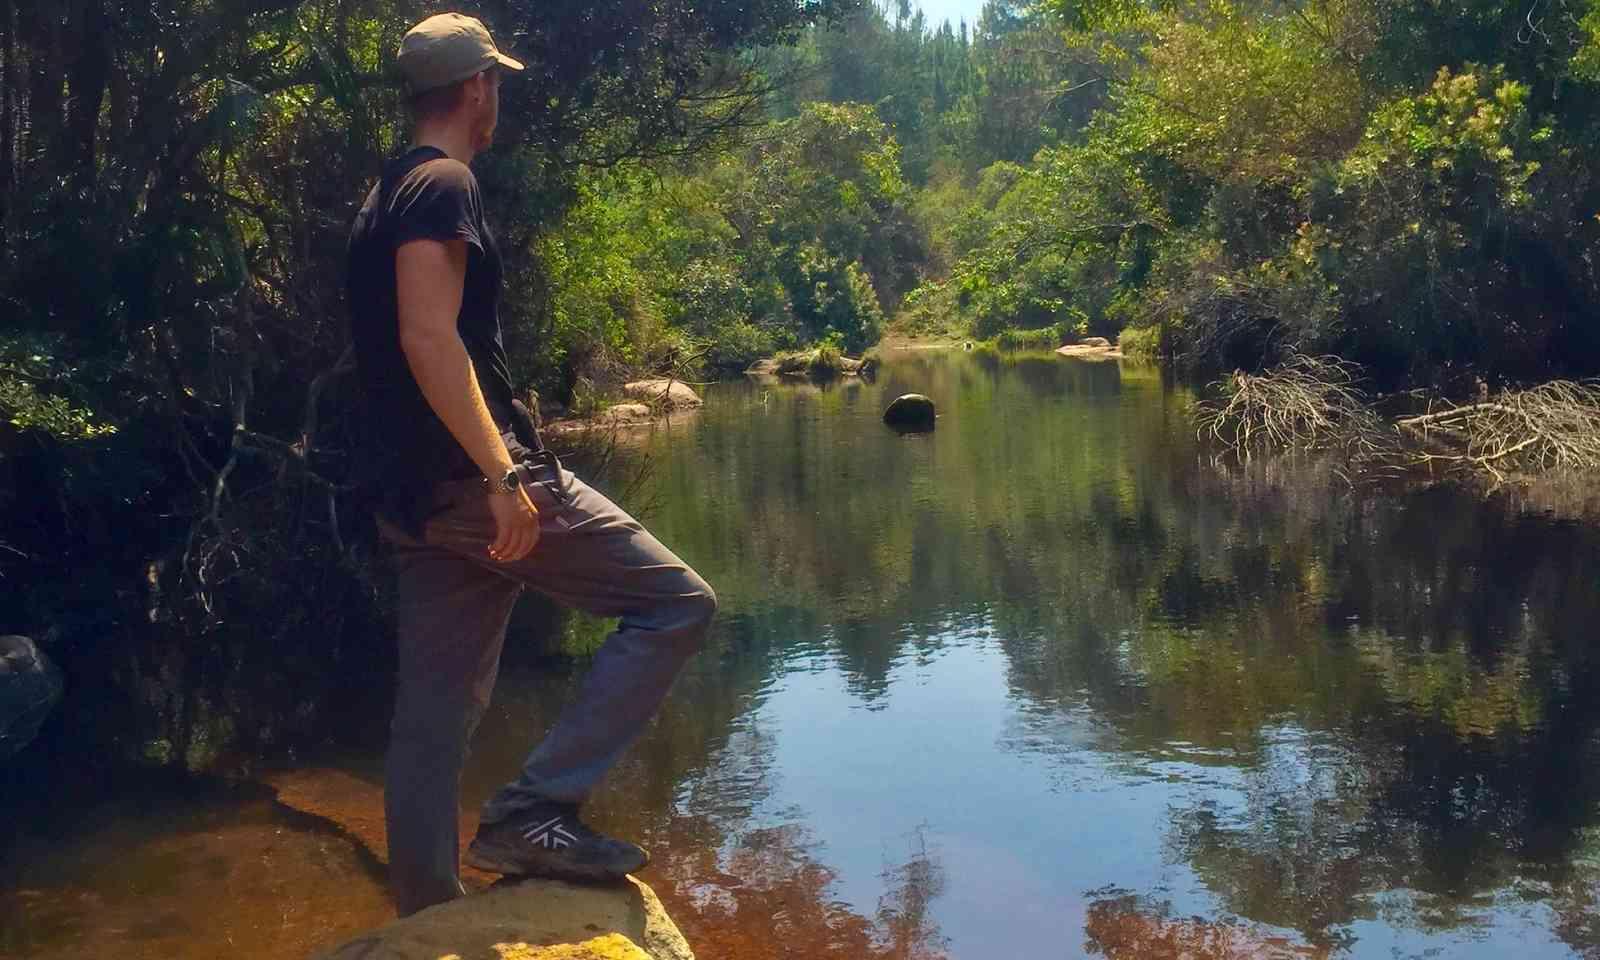 Ash contemplating a river (Suzanna Tierie)